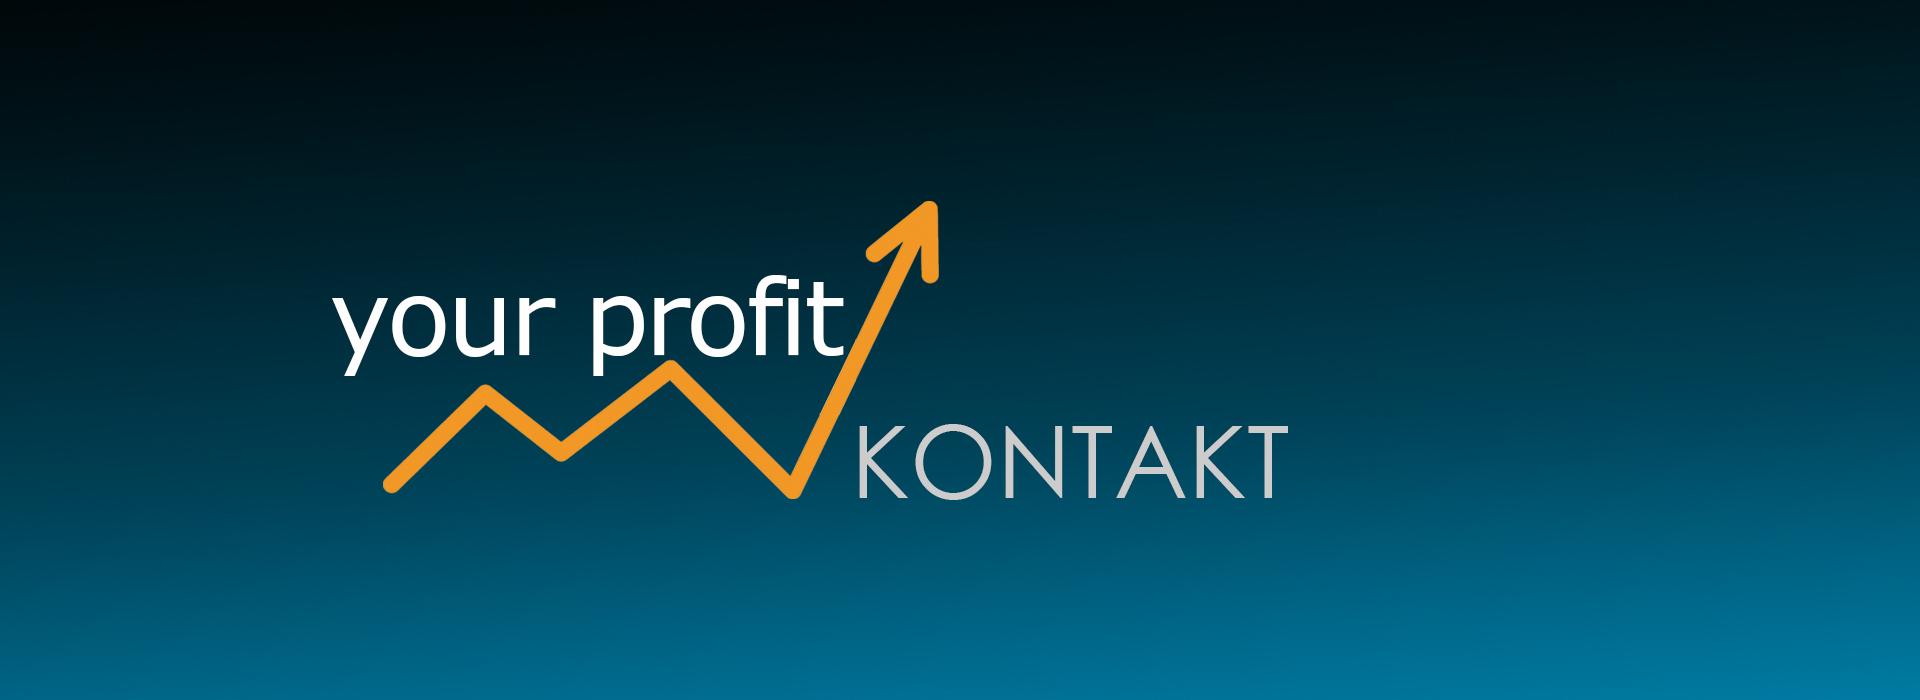 Your Profit Kontakt